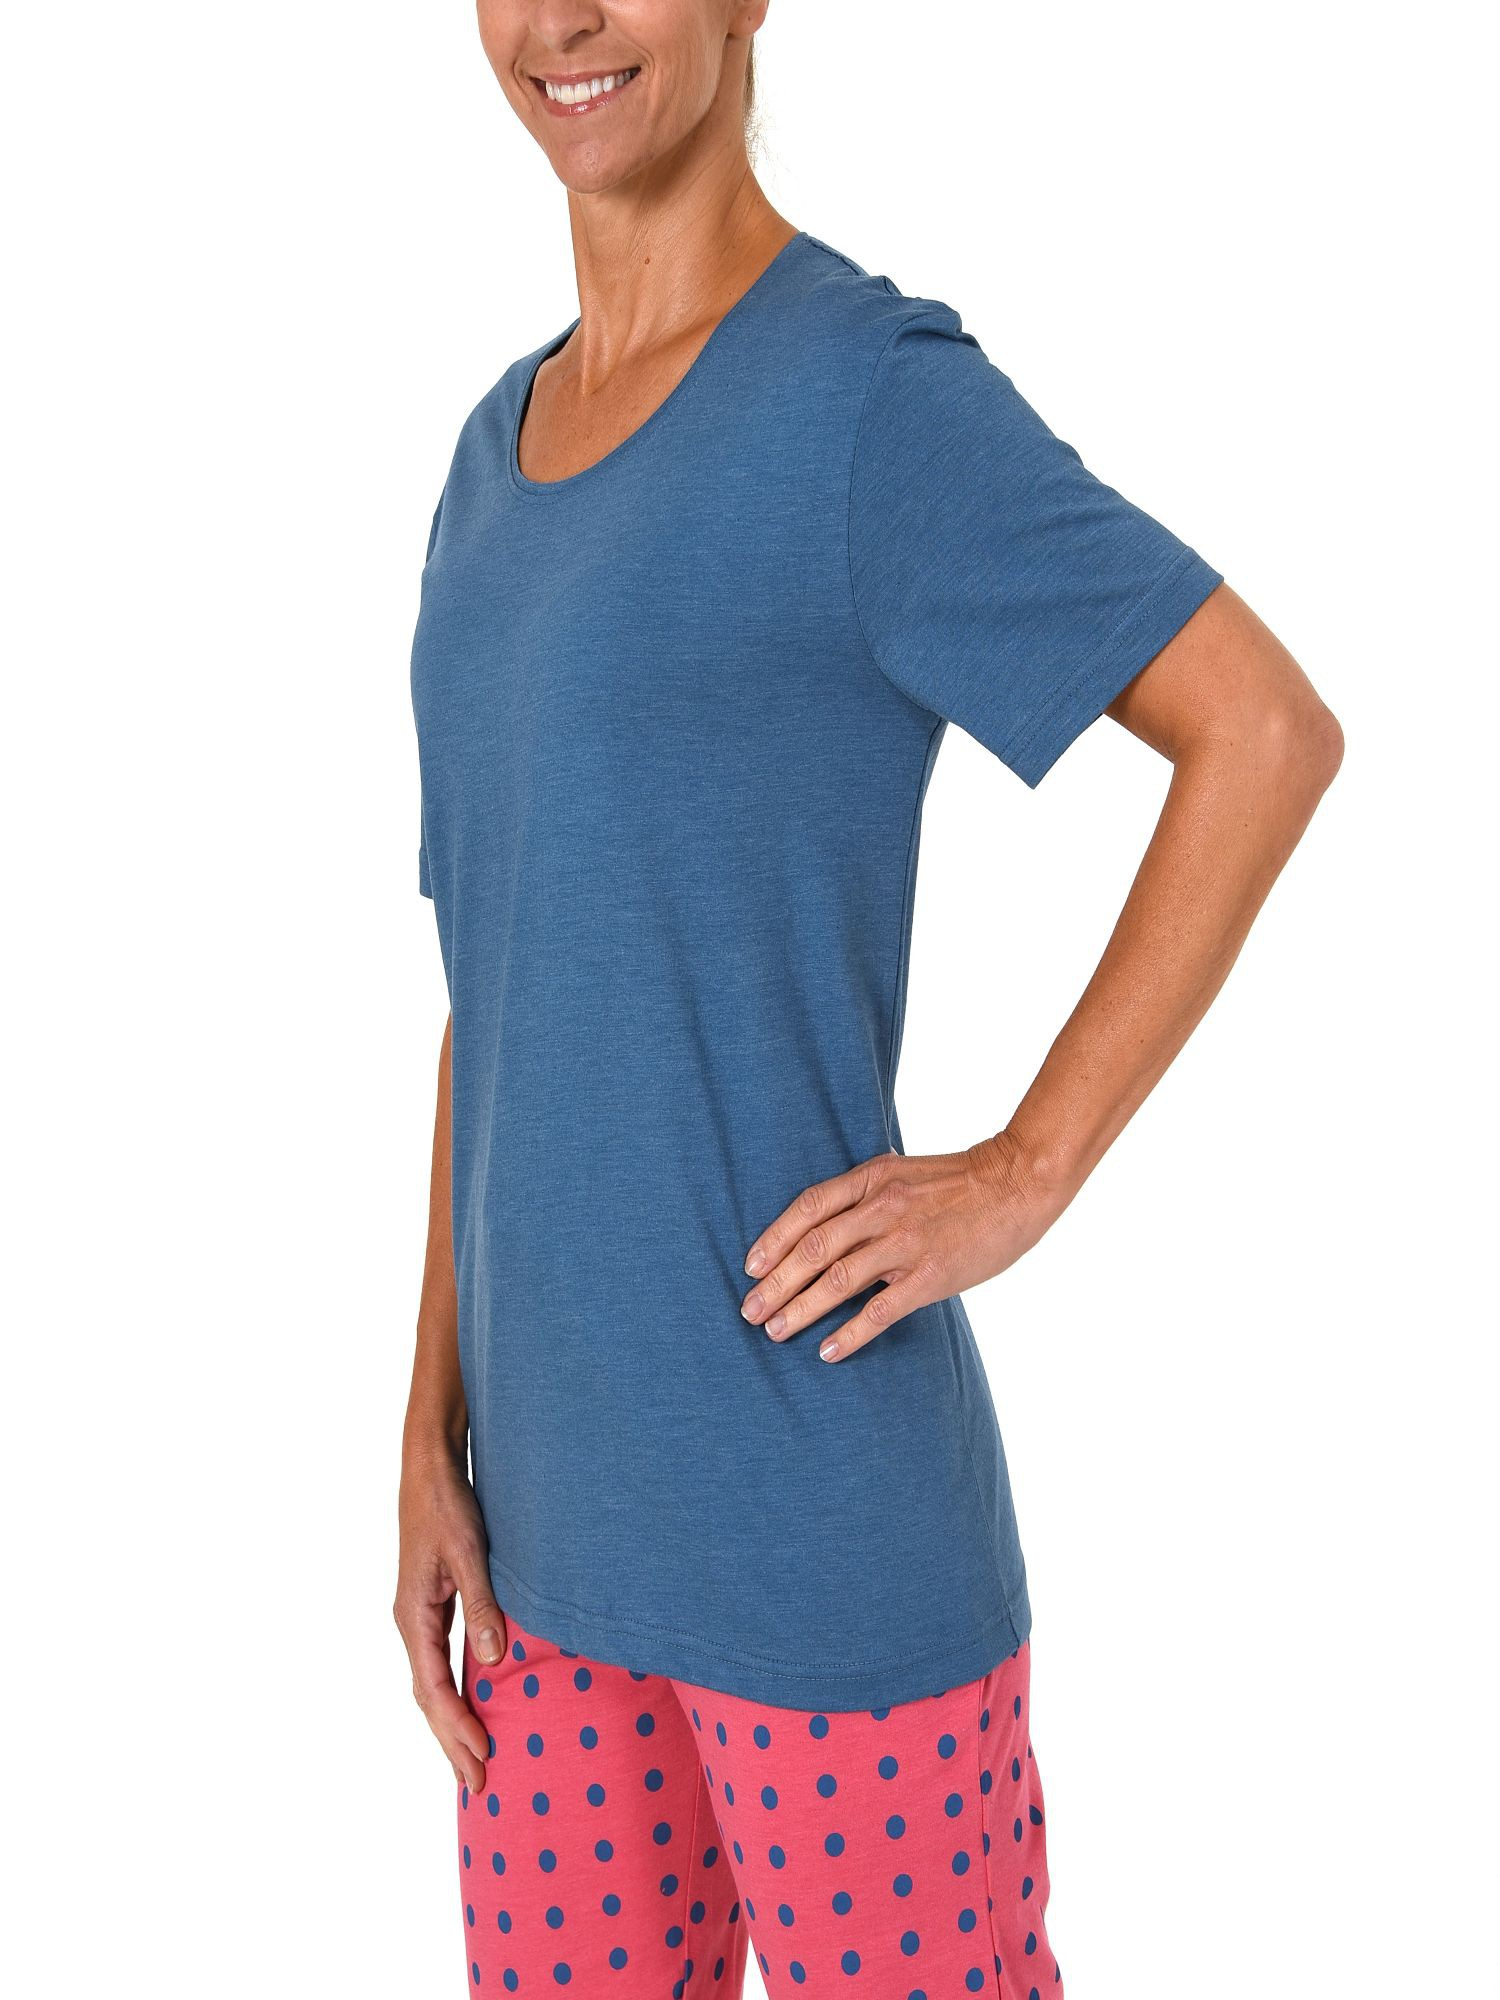 Damen Shirt - Oberteil kurzarm unifarben Mix & Match in rot oder jeansblau – 220 90 514 – Bild 2